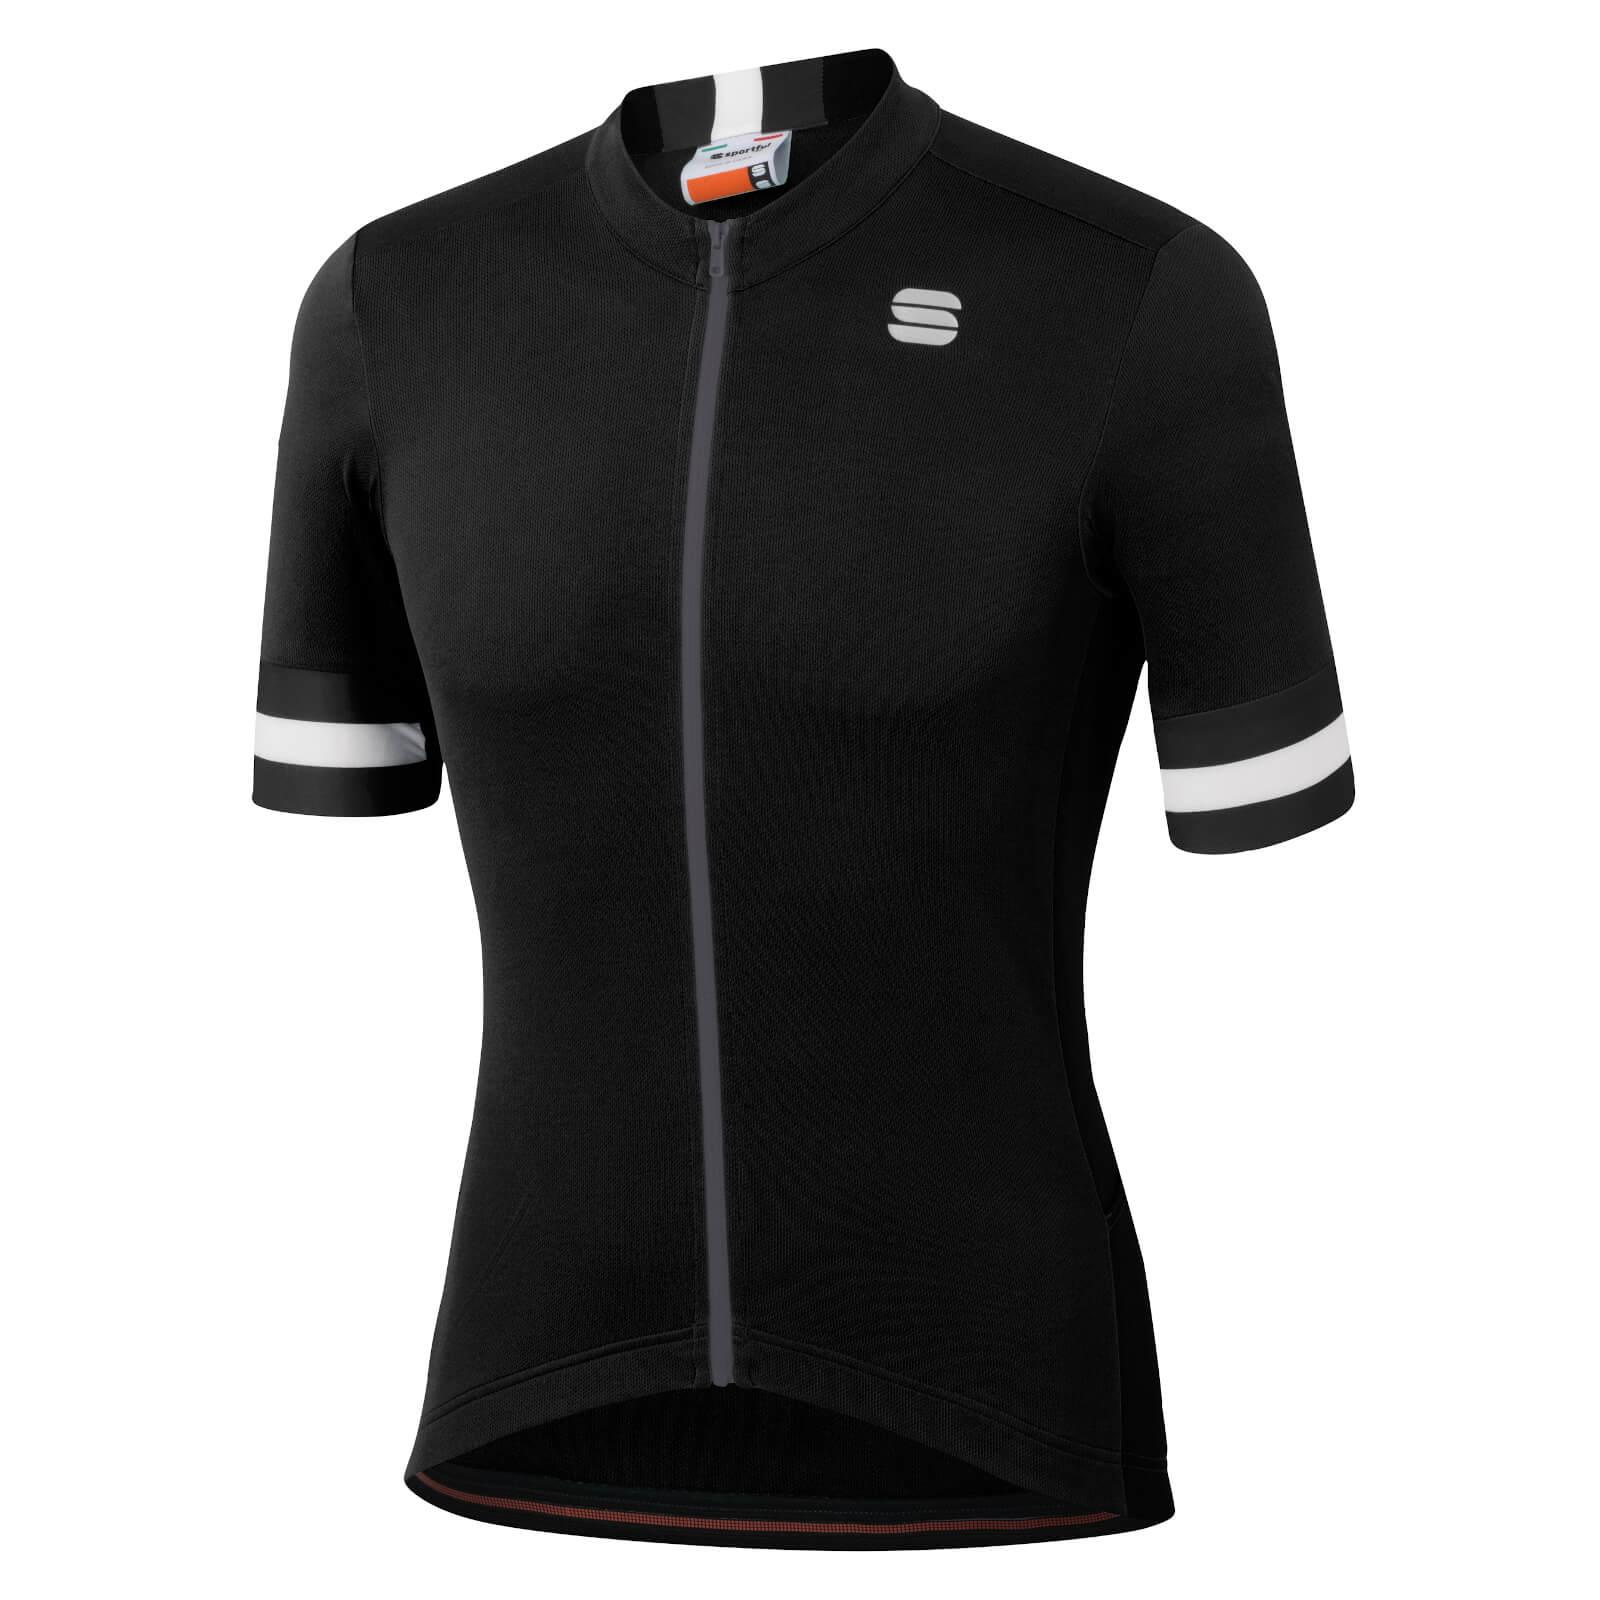 Sportful Kite Jersey - S - Black